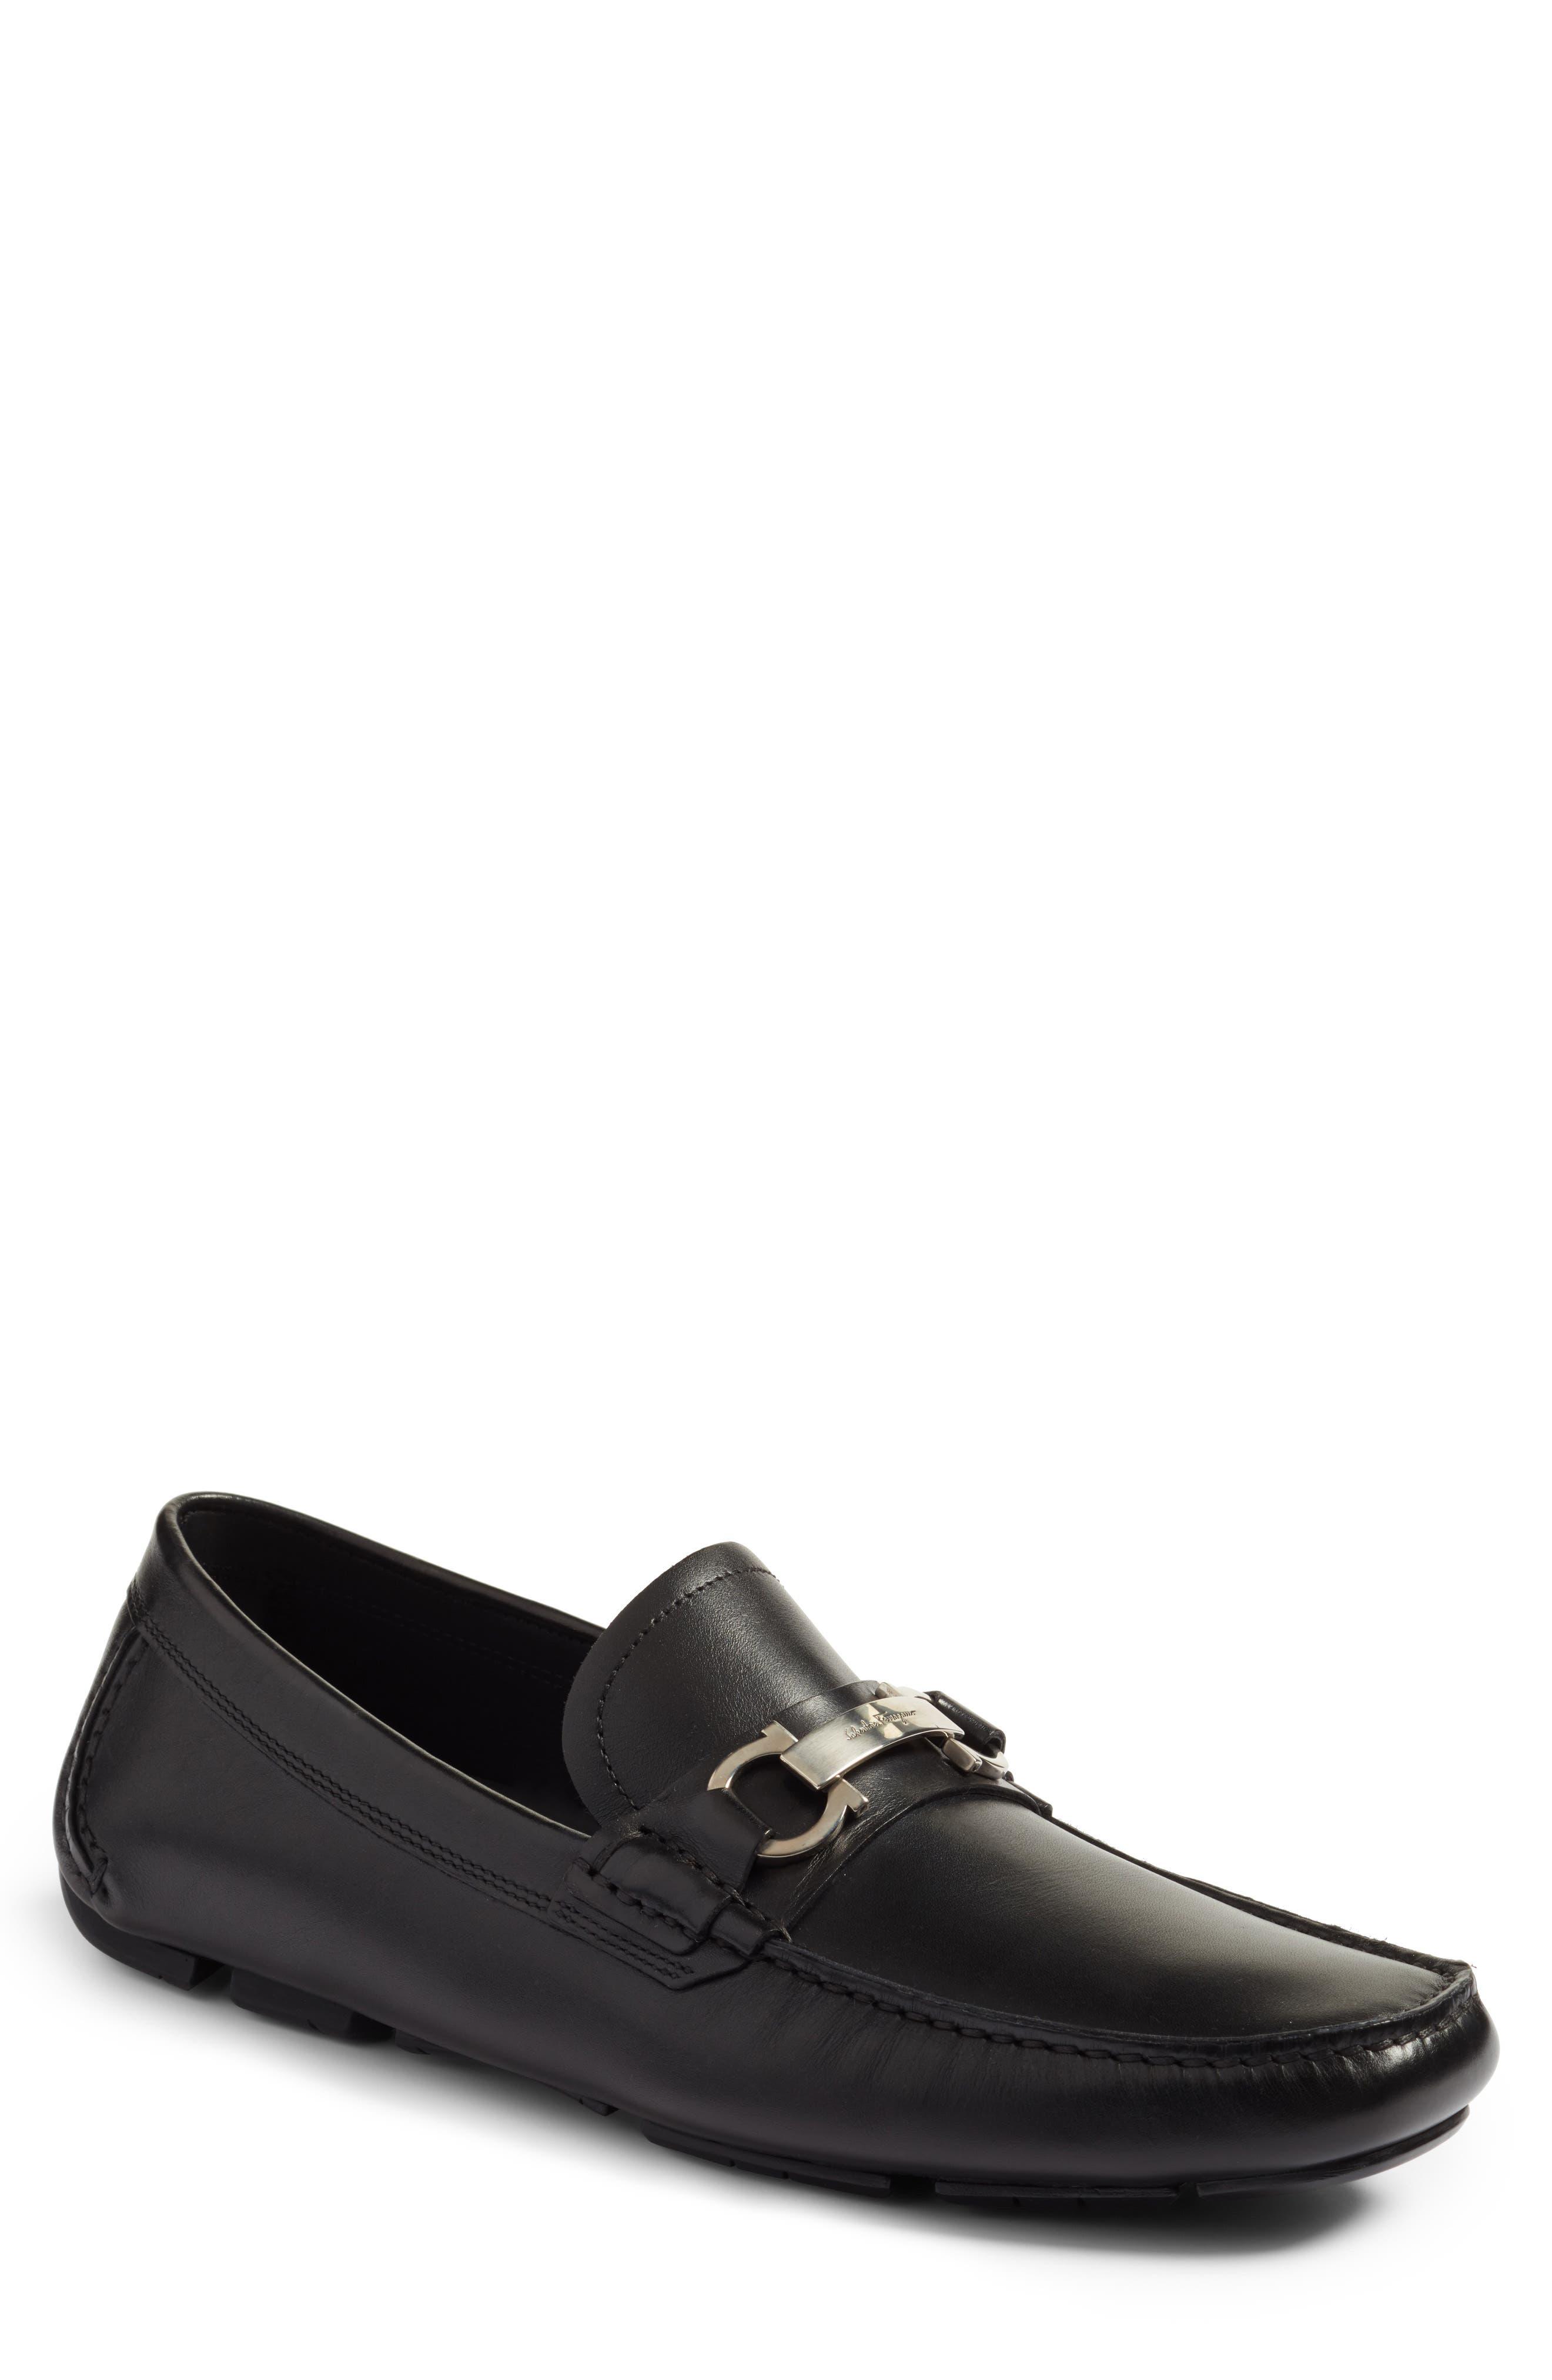 Salvatore Ferragamo Driving Shoe (Men)